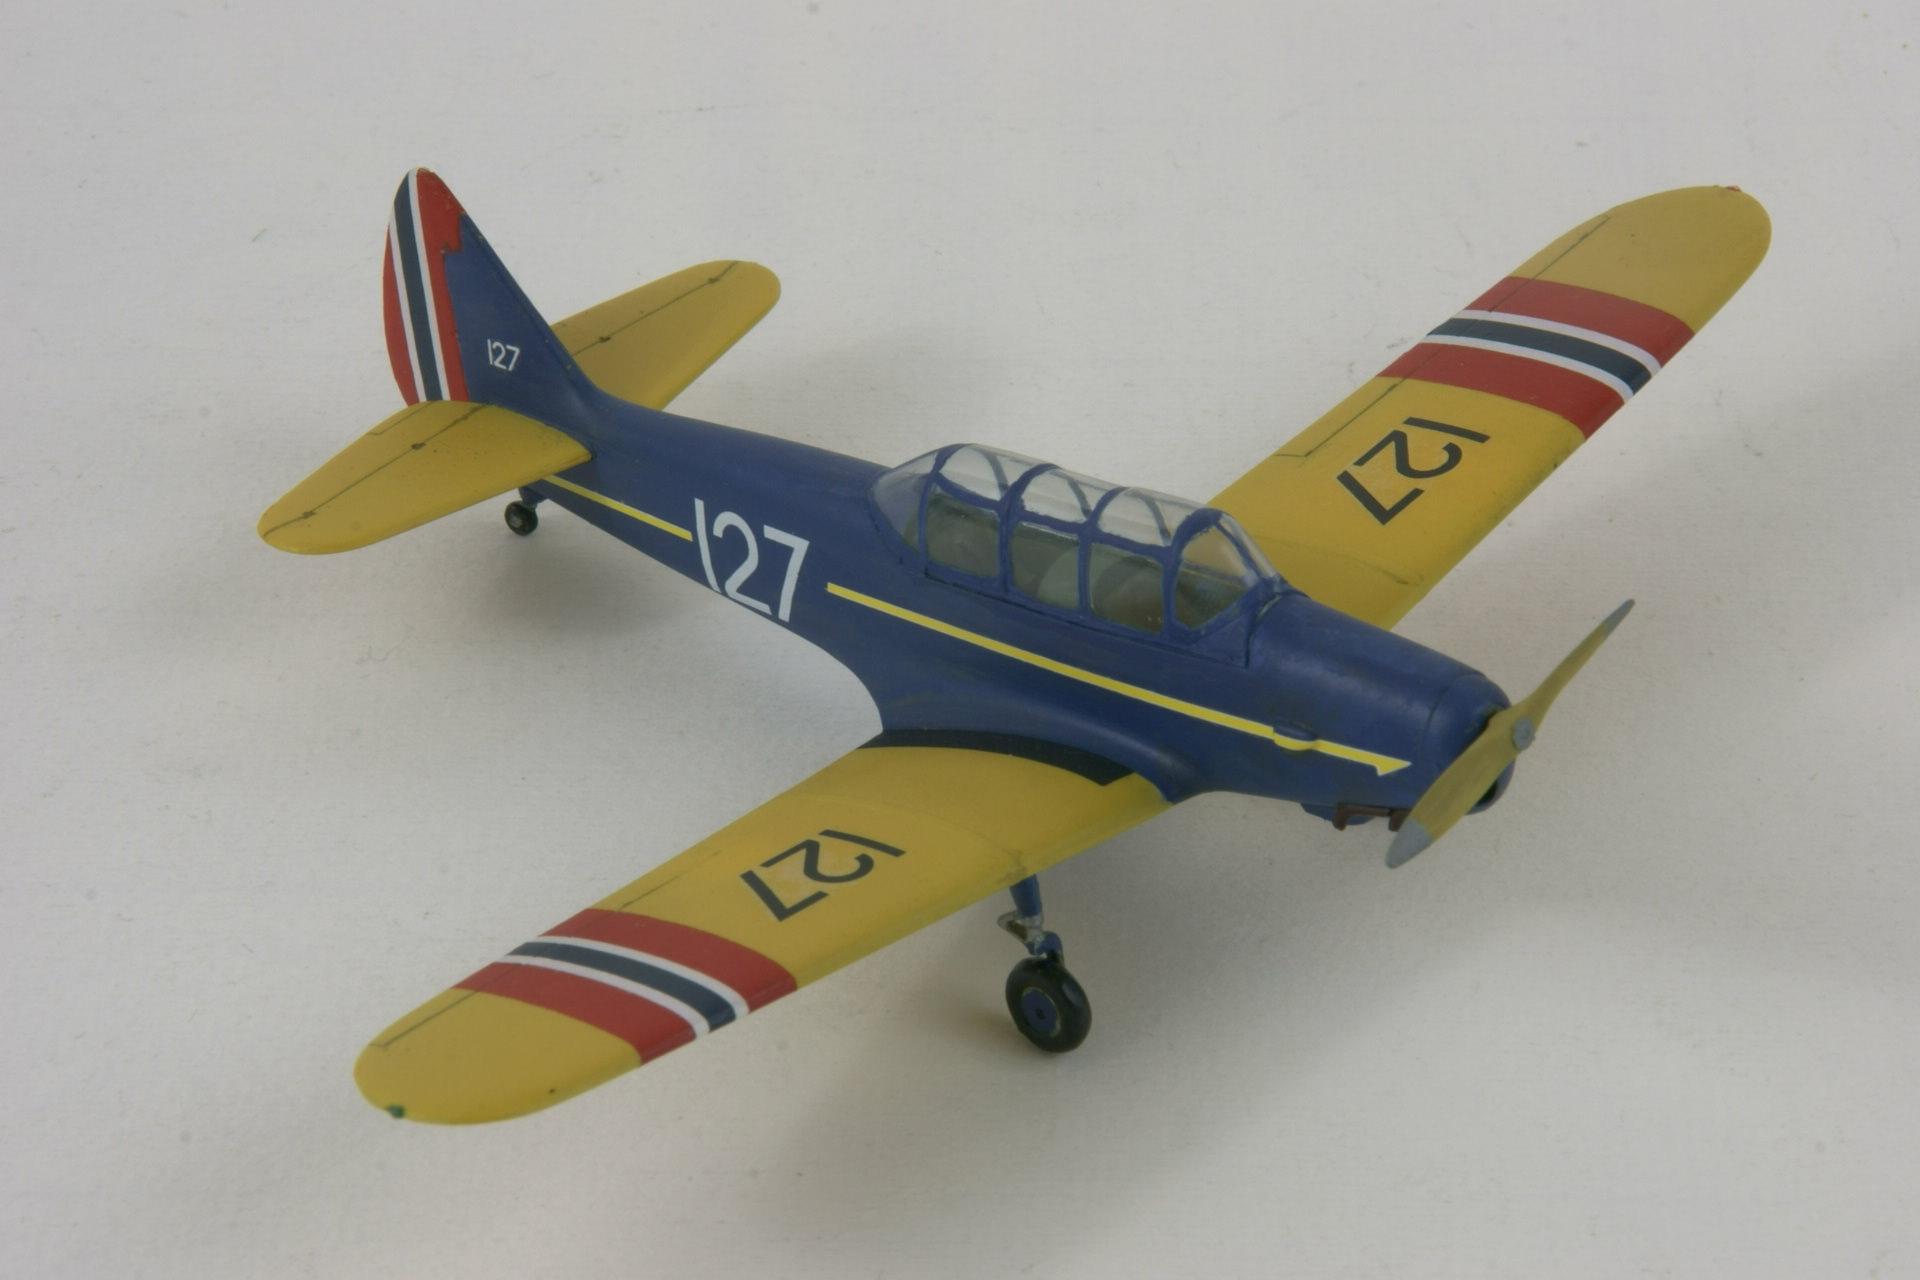 Fairchild pt 26 cornell i 3 1